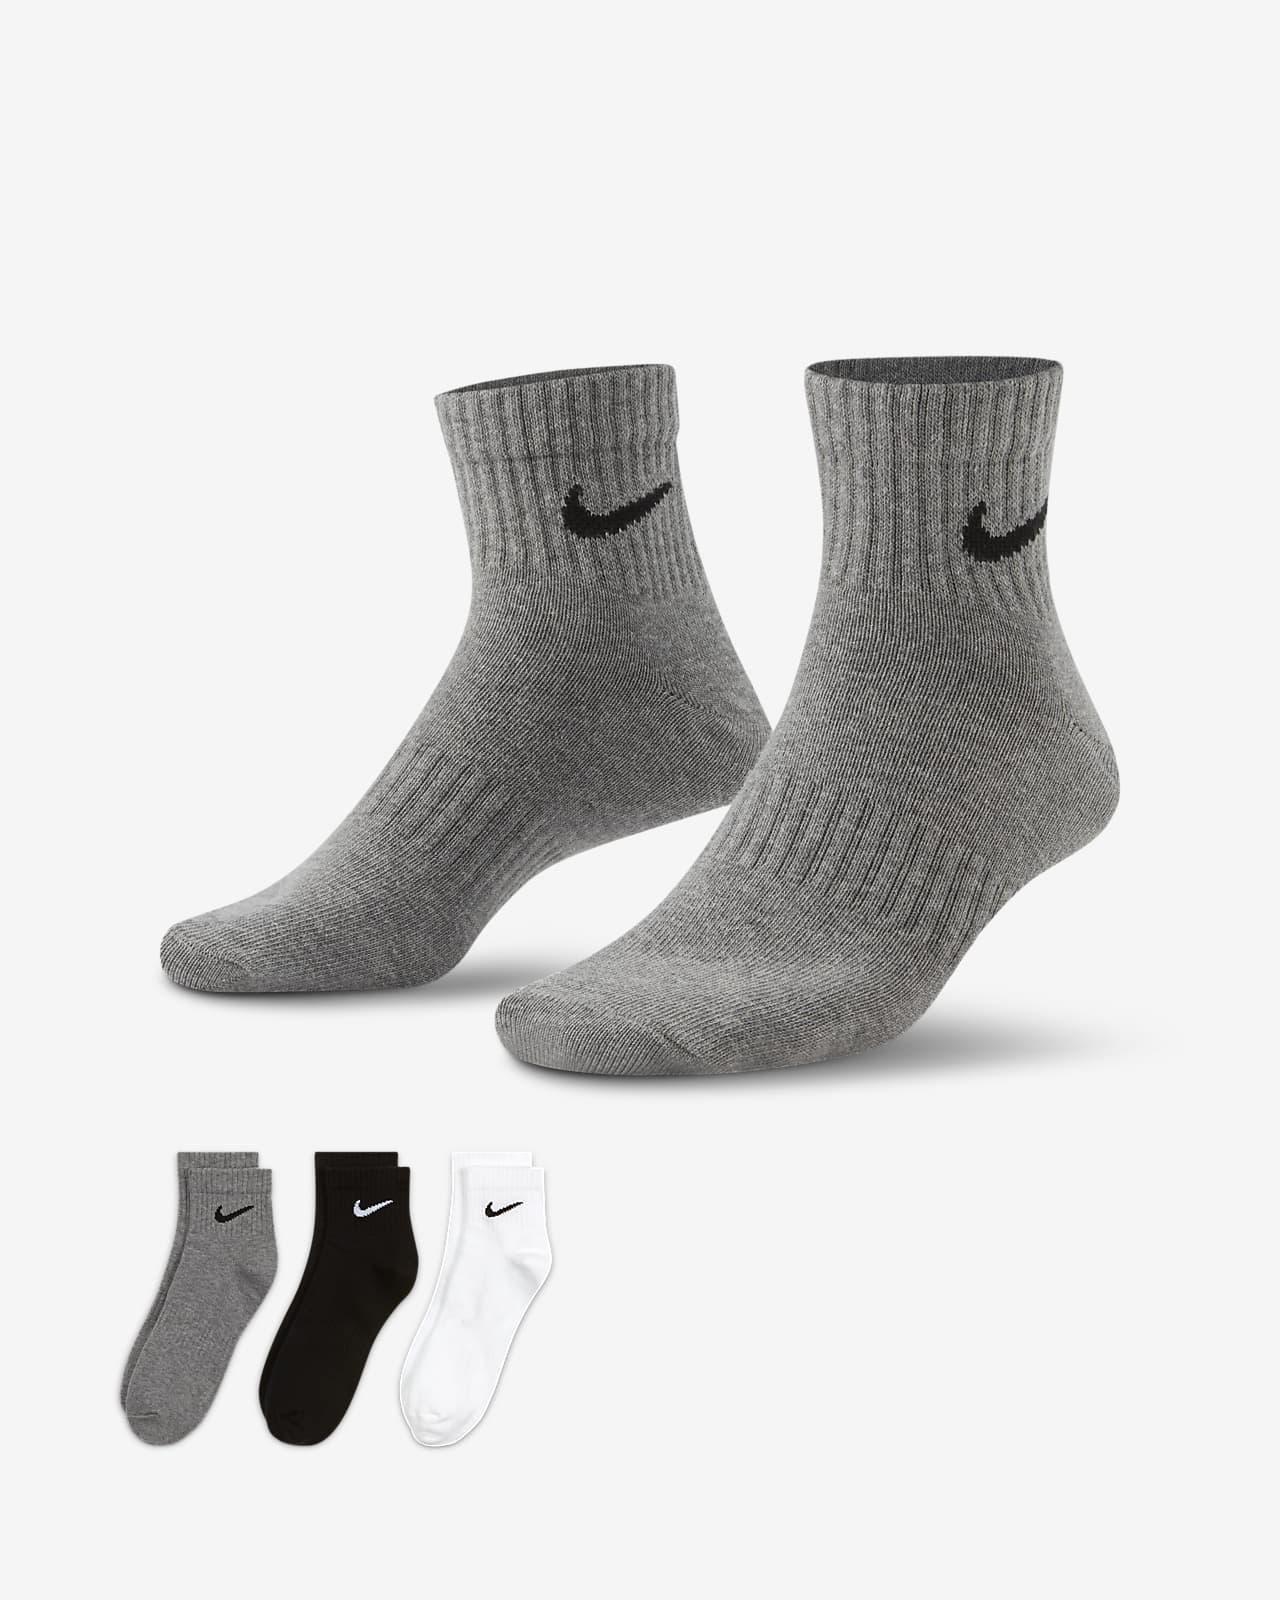 Nike Everyday Lightweight Training Ankle Socks (3 Pairs)